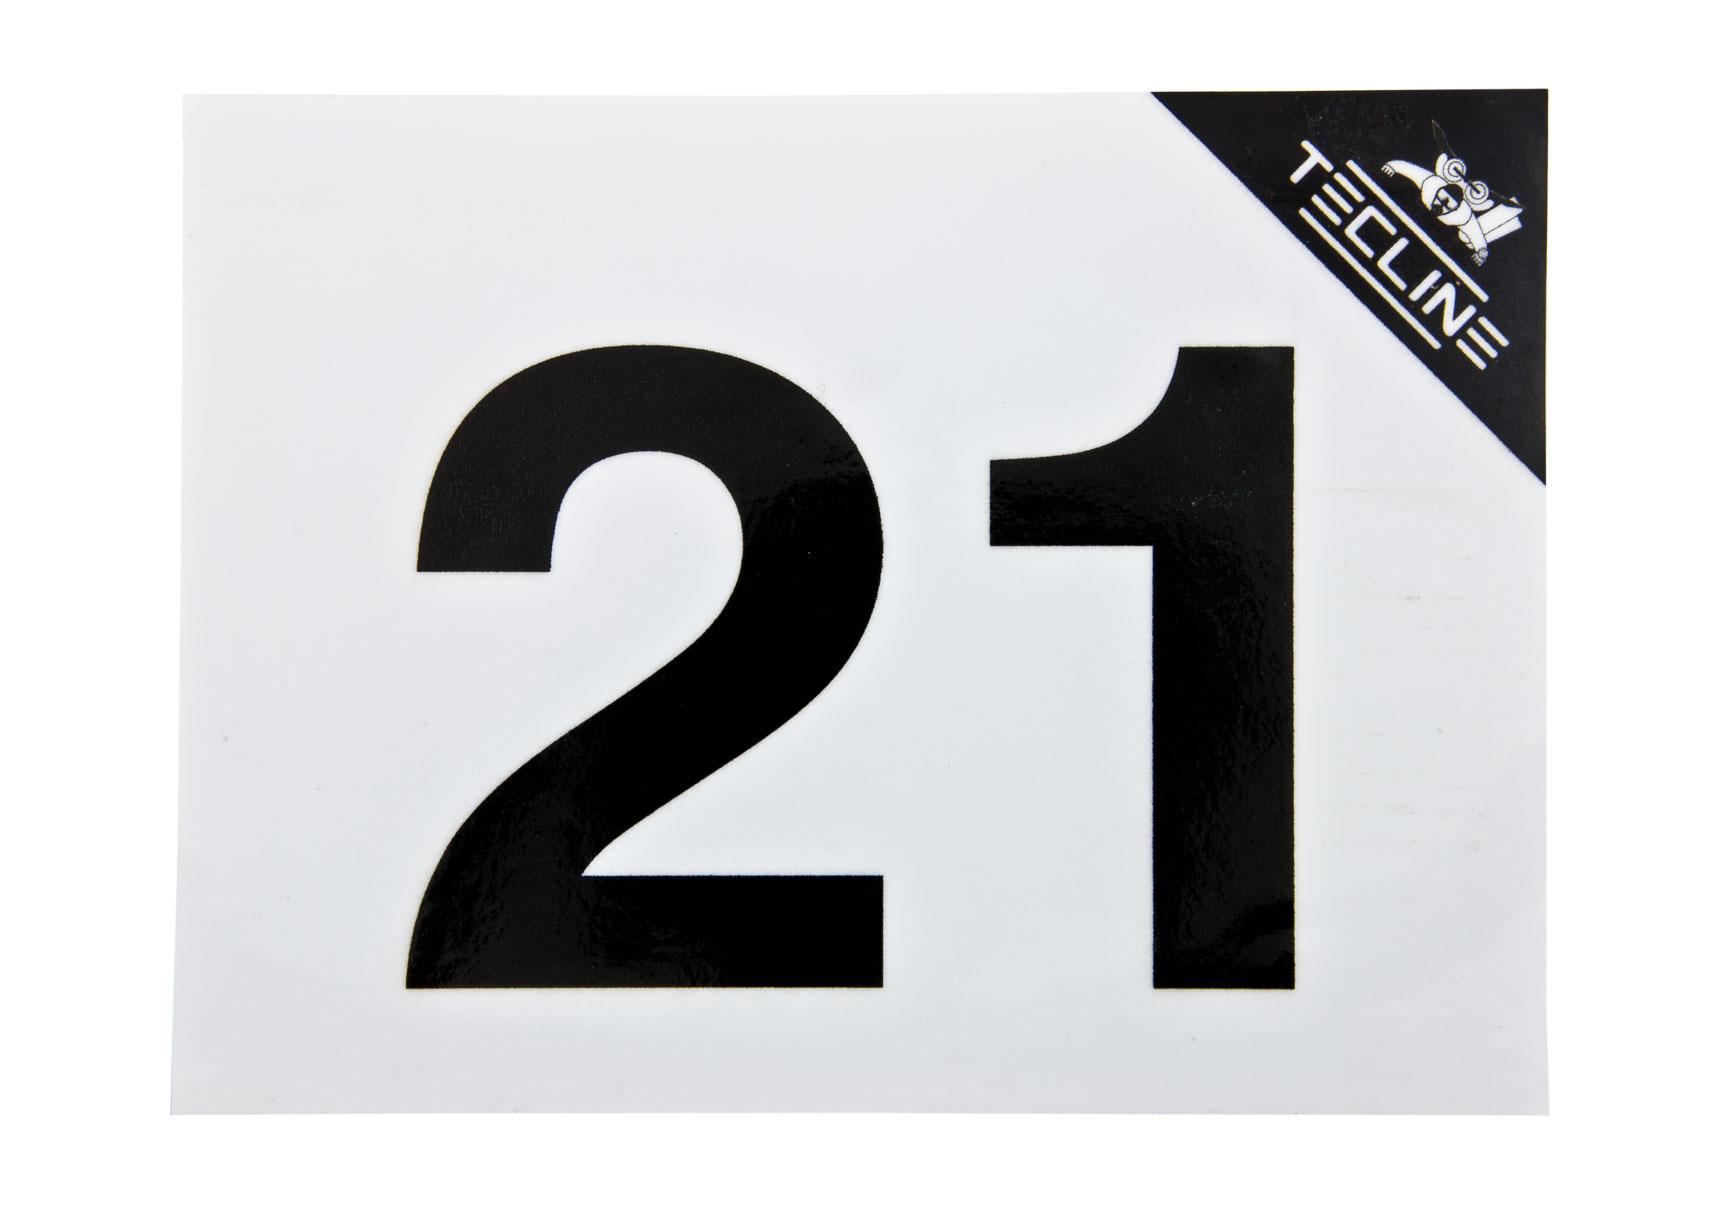 t200701